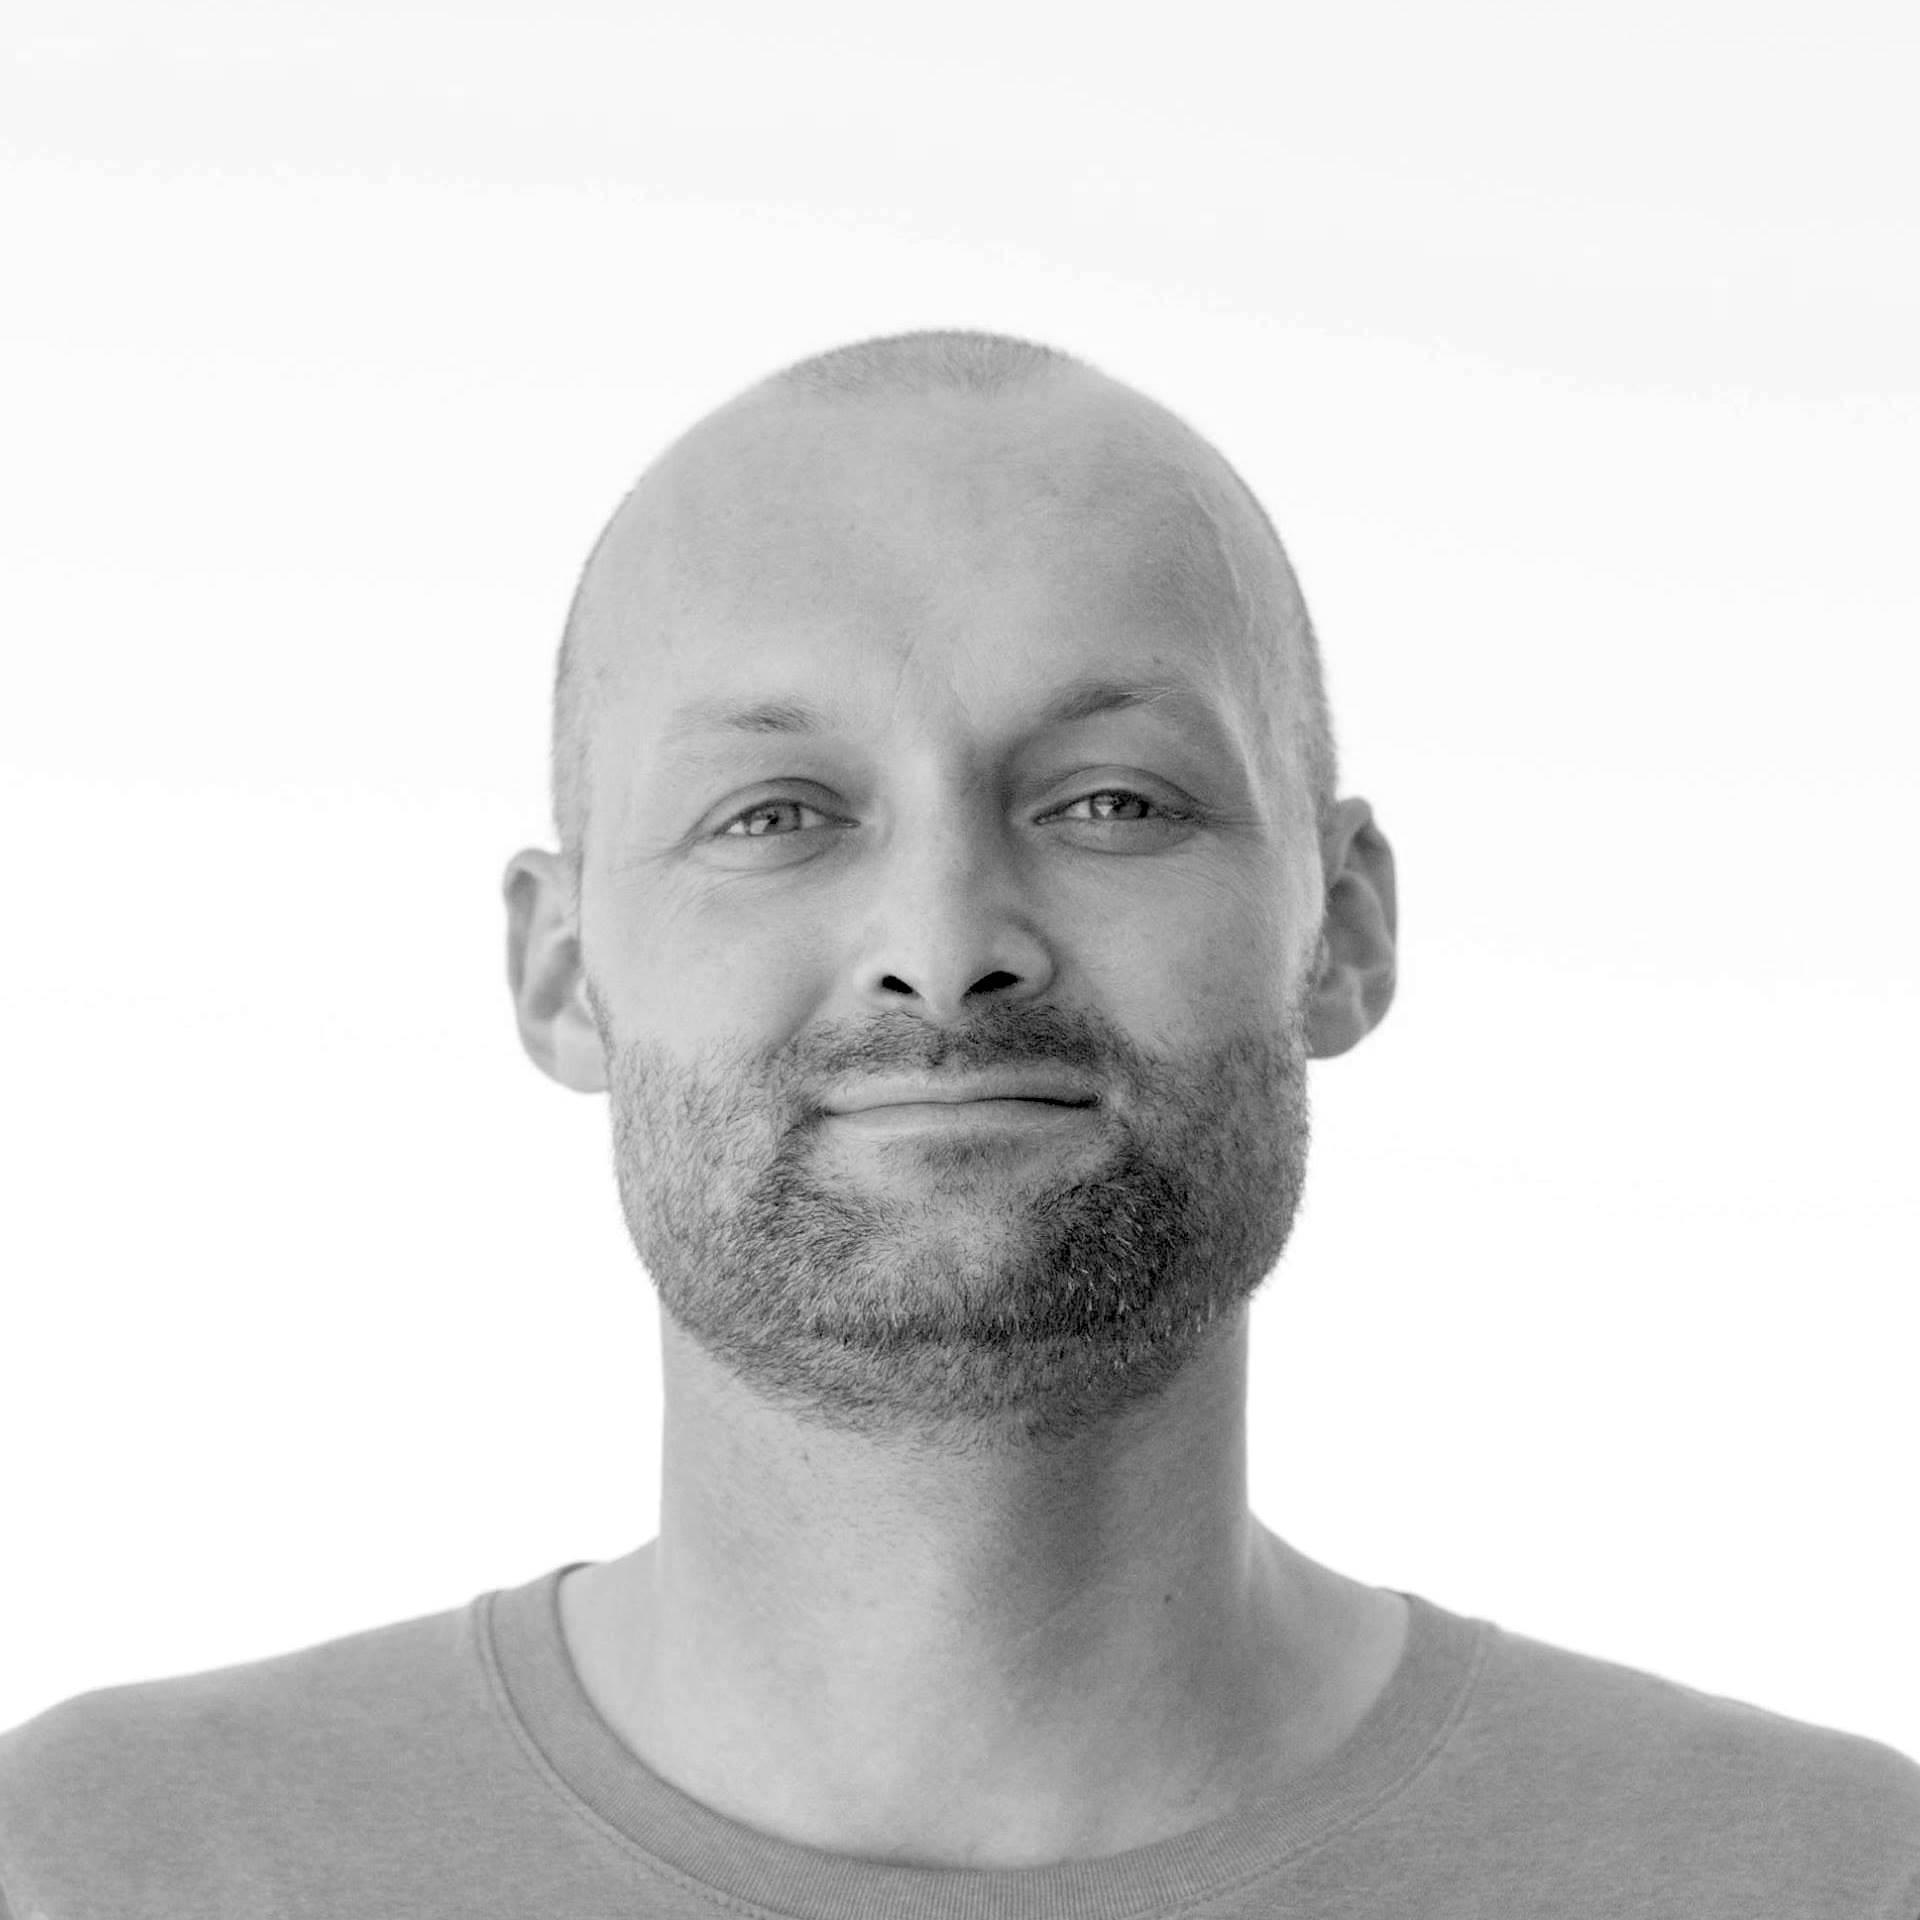 Go to Roman Pohorecki's profile